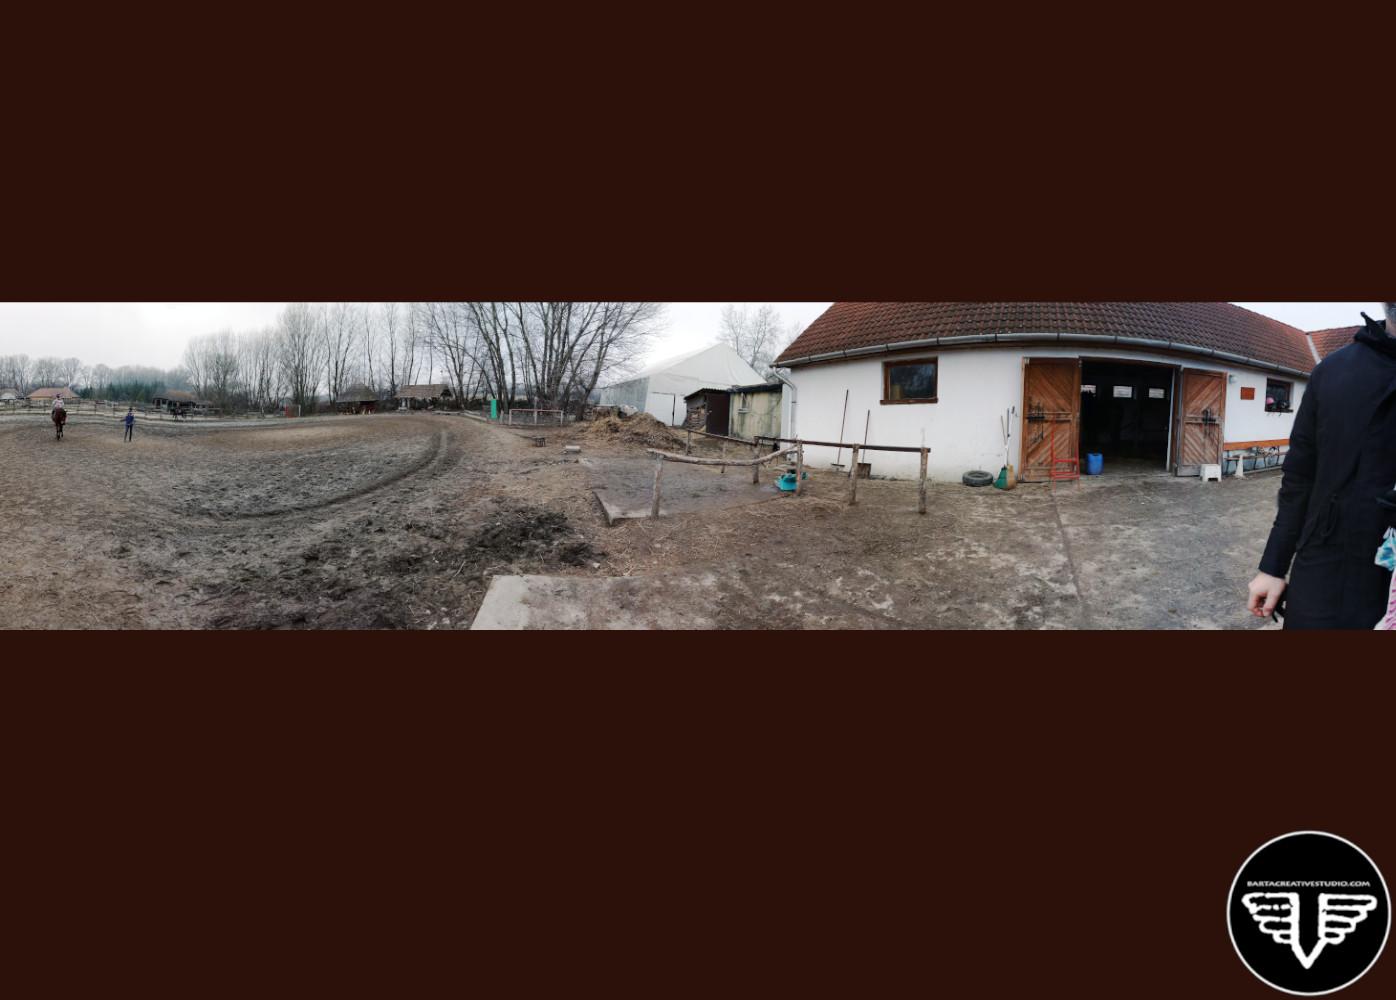 panoramafoto02.jpg